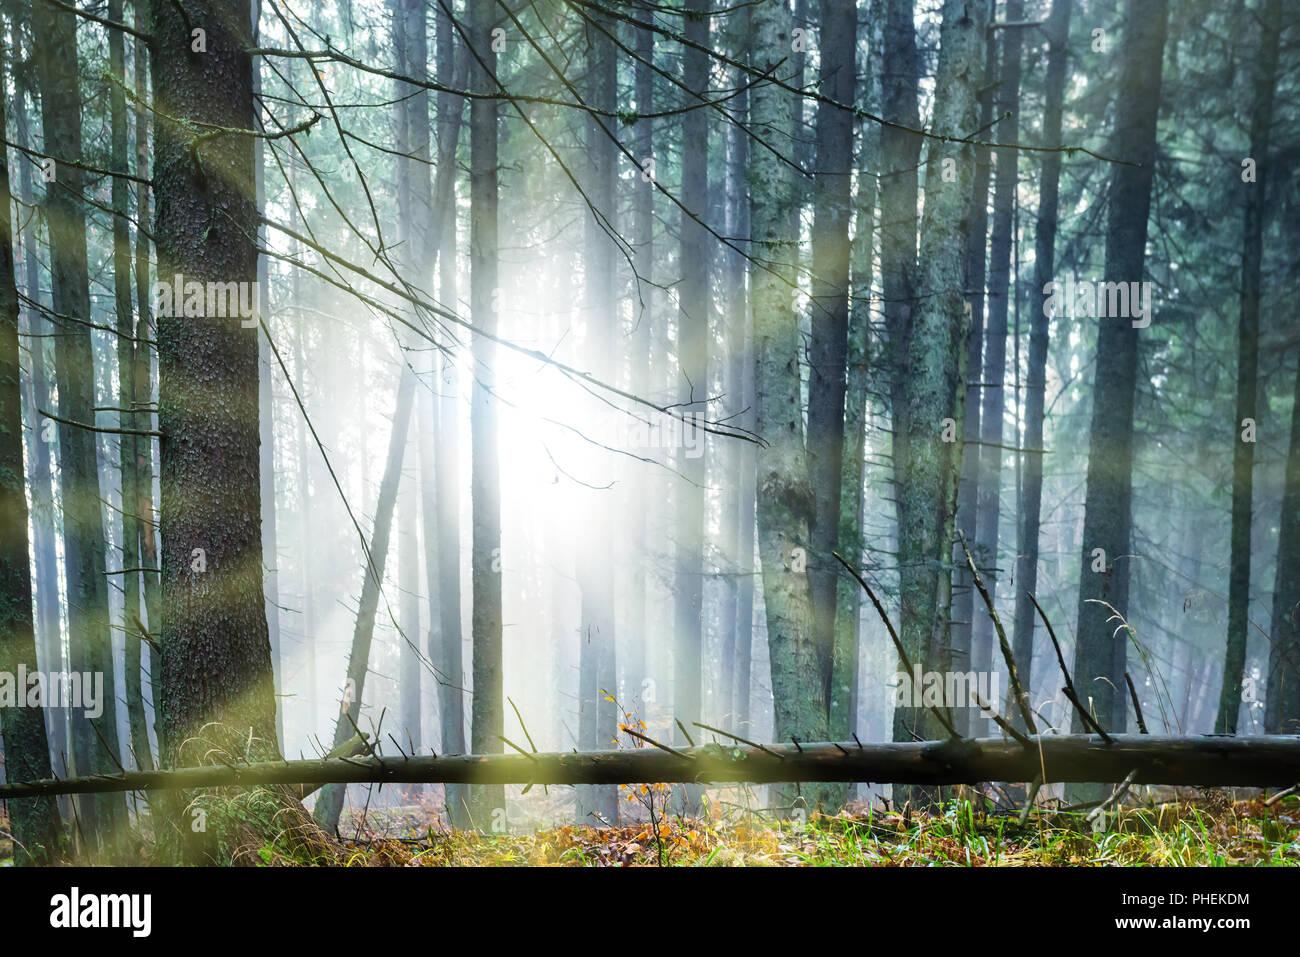 Sun shining through trees - Stock Image